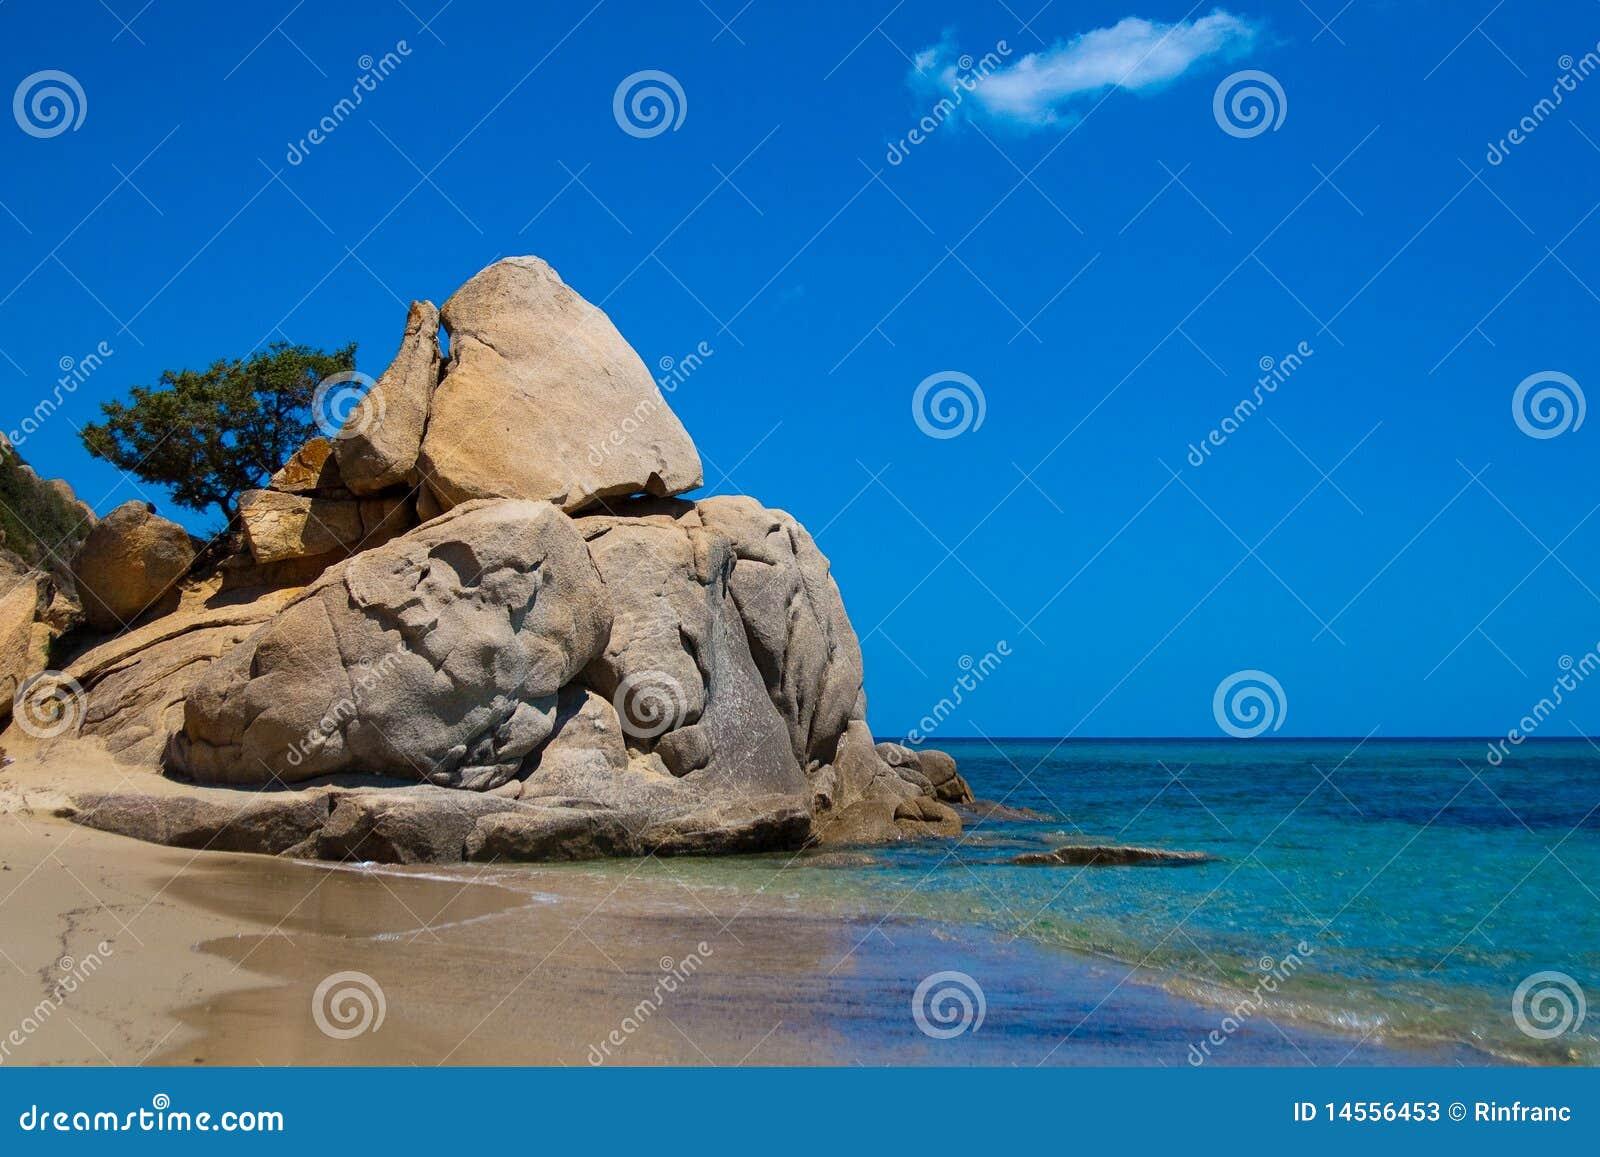 A rock on the Costarei beach